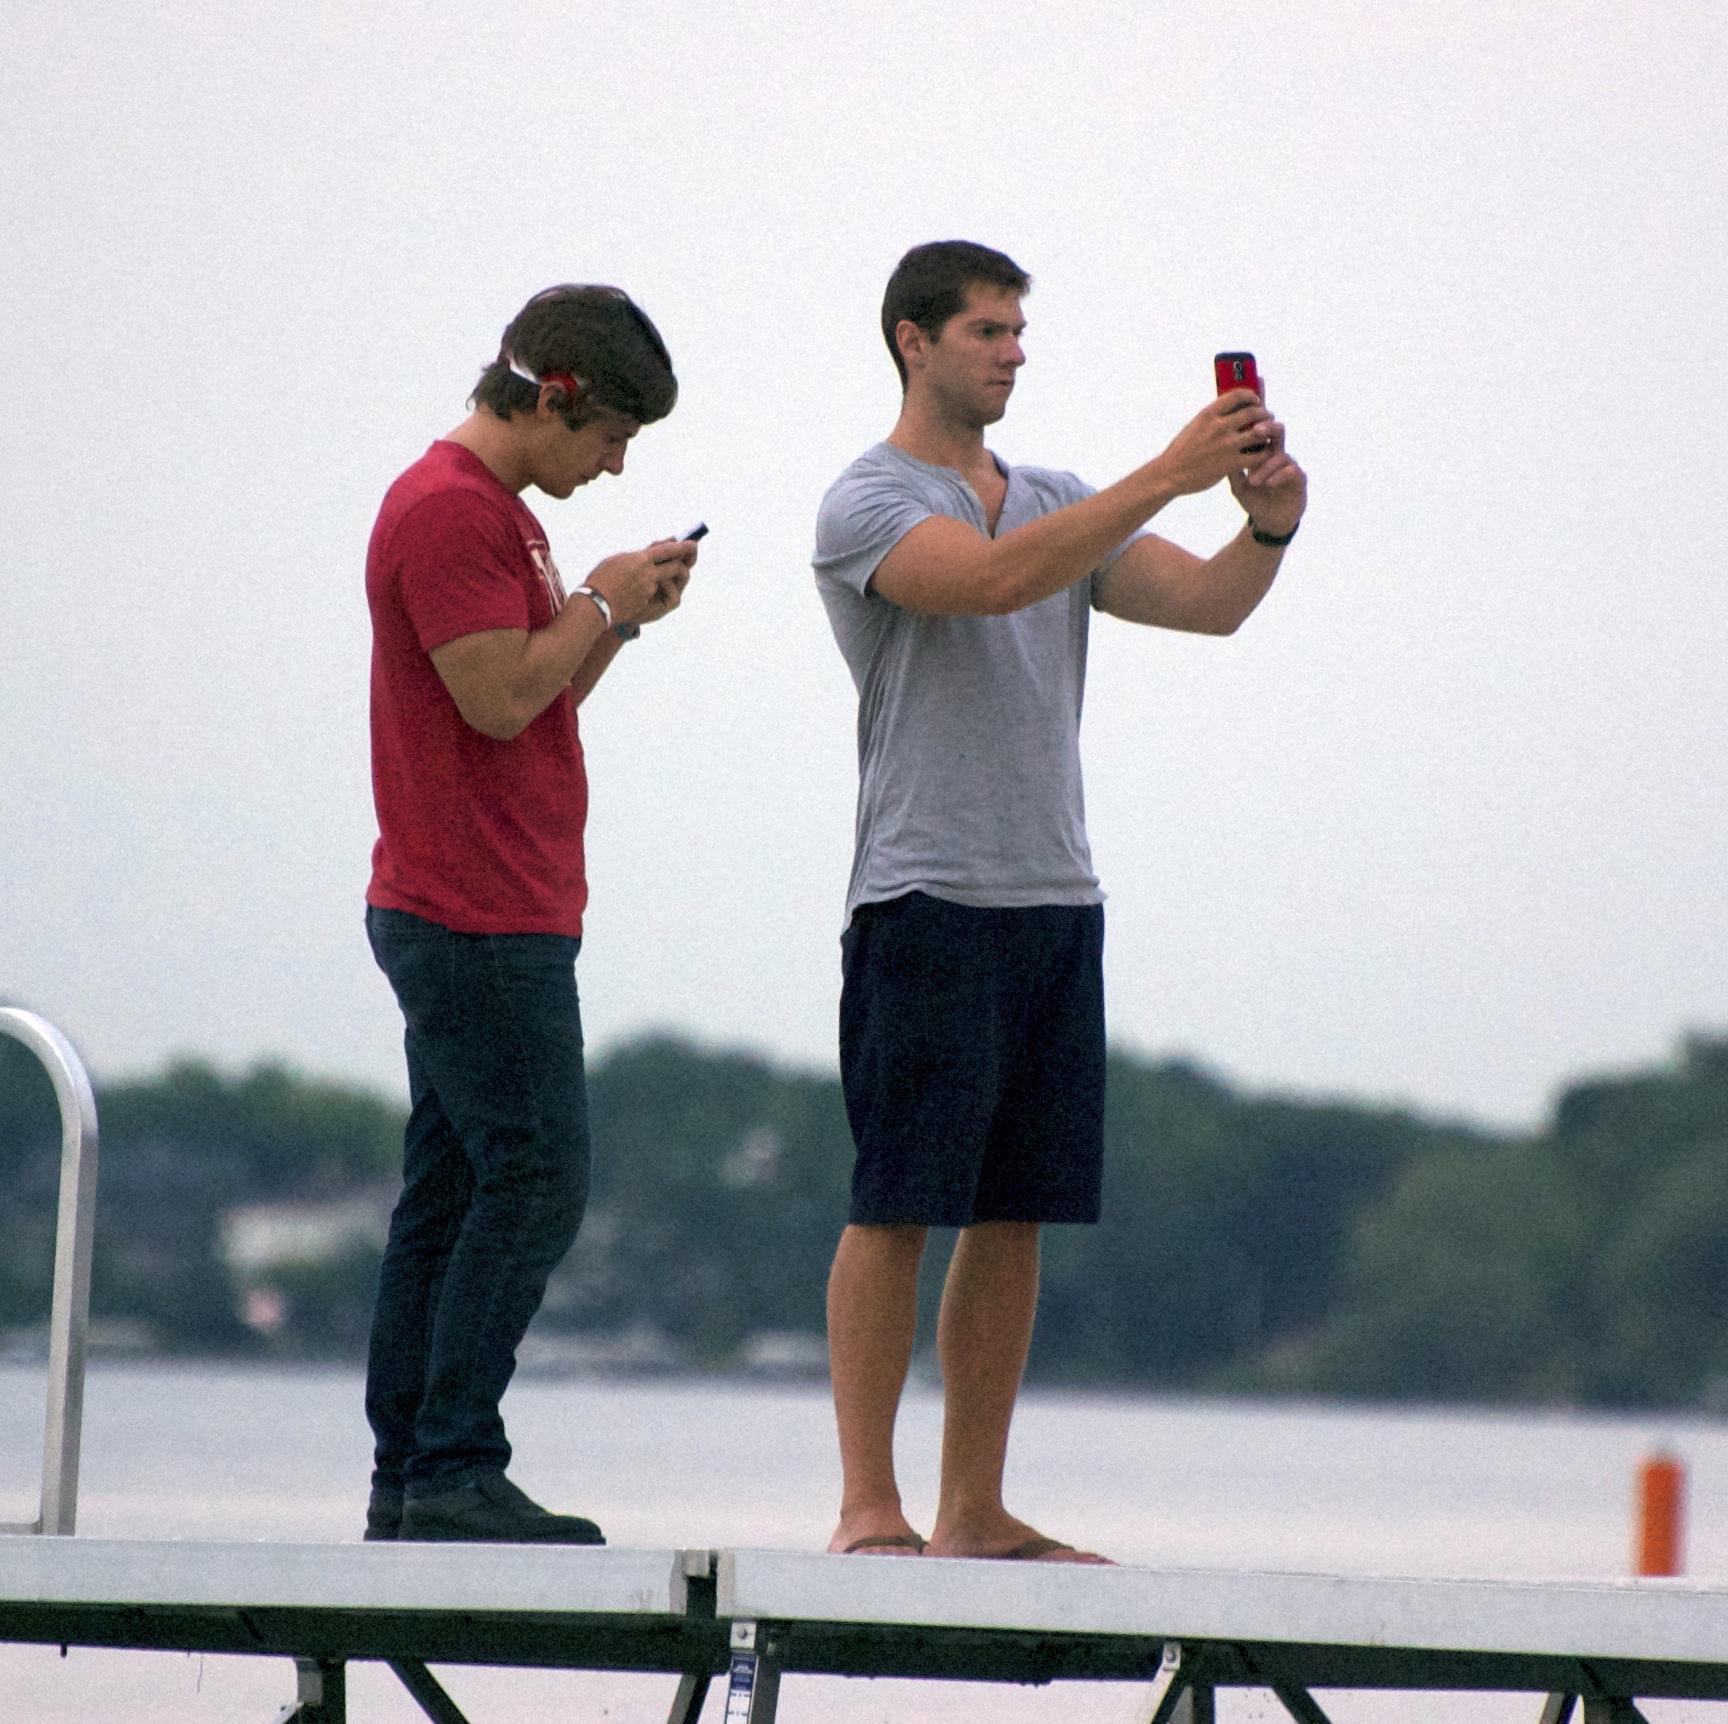 Camera Men 2. Memorial Union Terrace. Madison, Wisconsin. July 2014. © William D. Walker